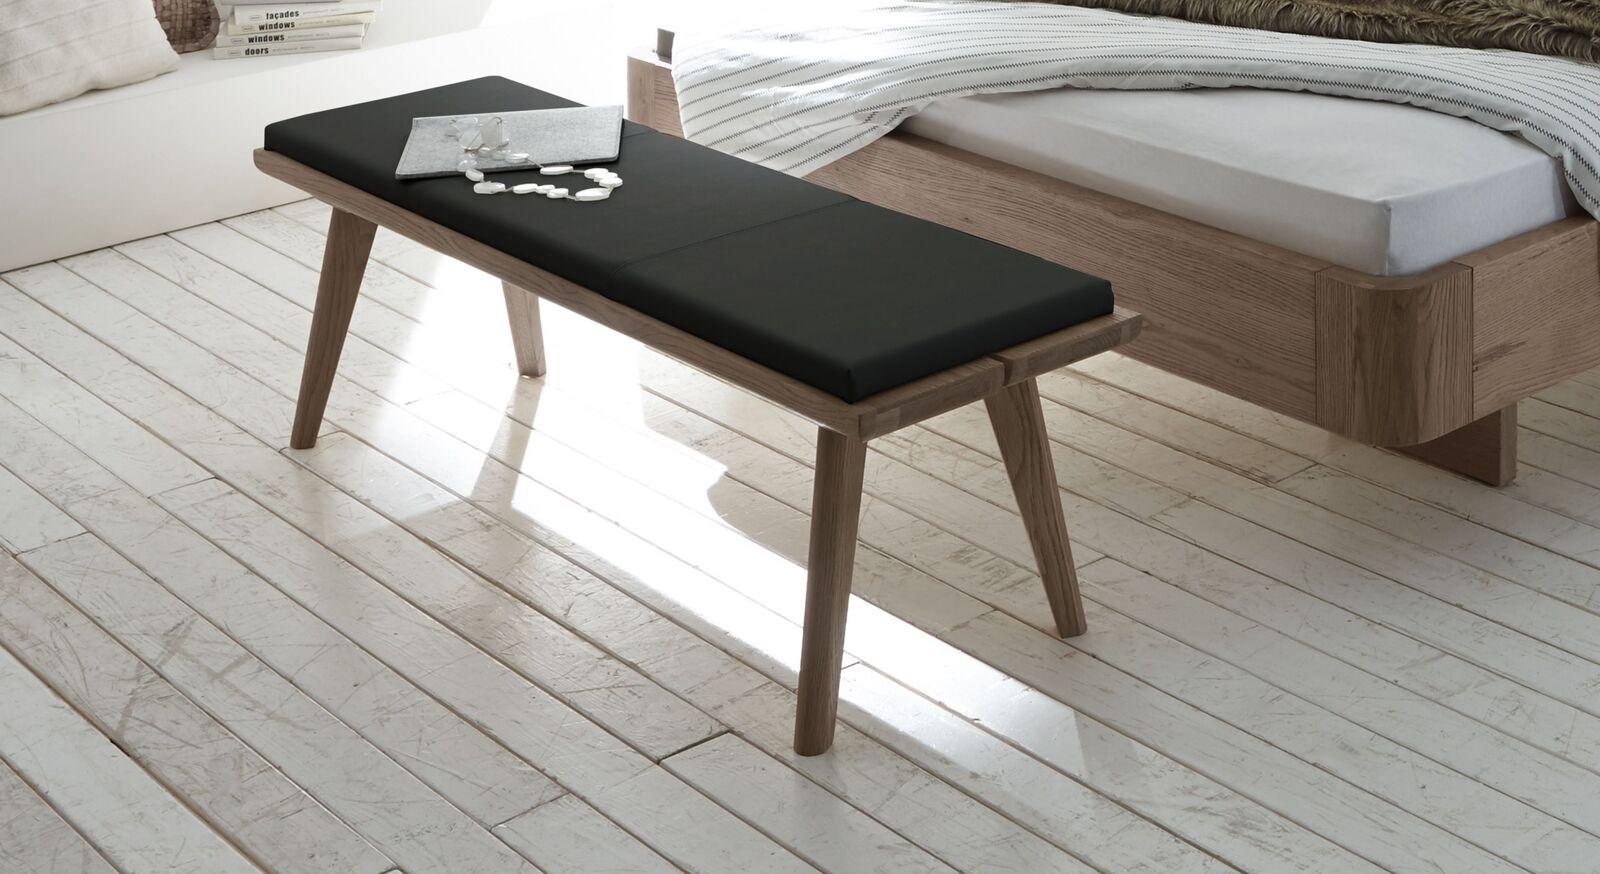 Stabile Bettbank Inesis aus Echtholz